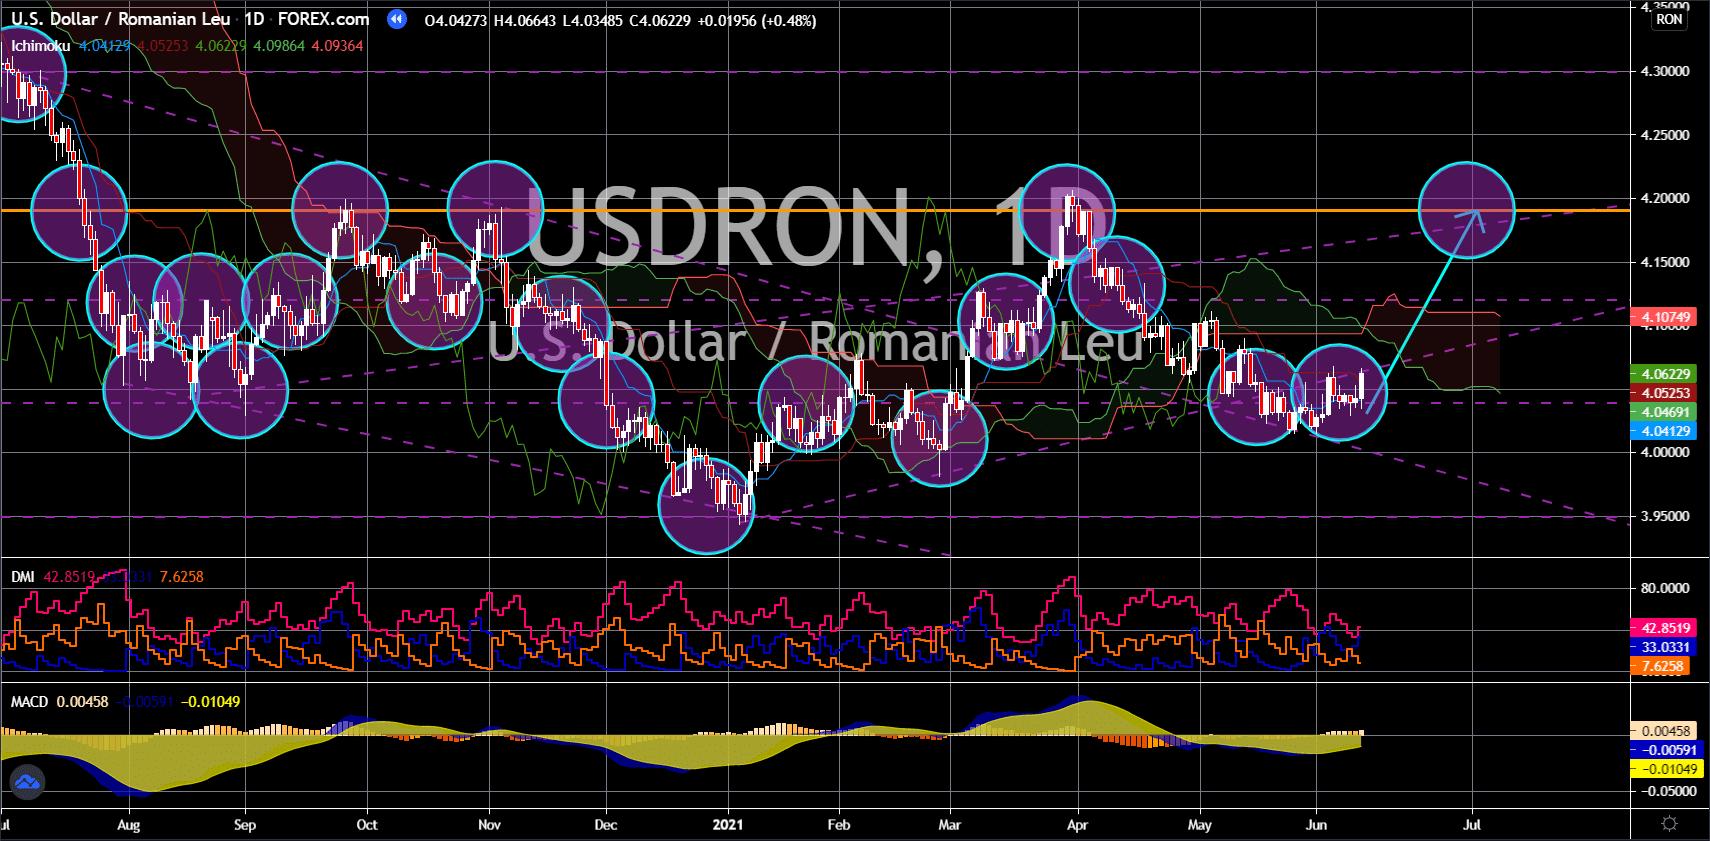 FinanceBrokerage - Market News: USD/RON Chart